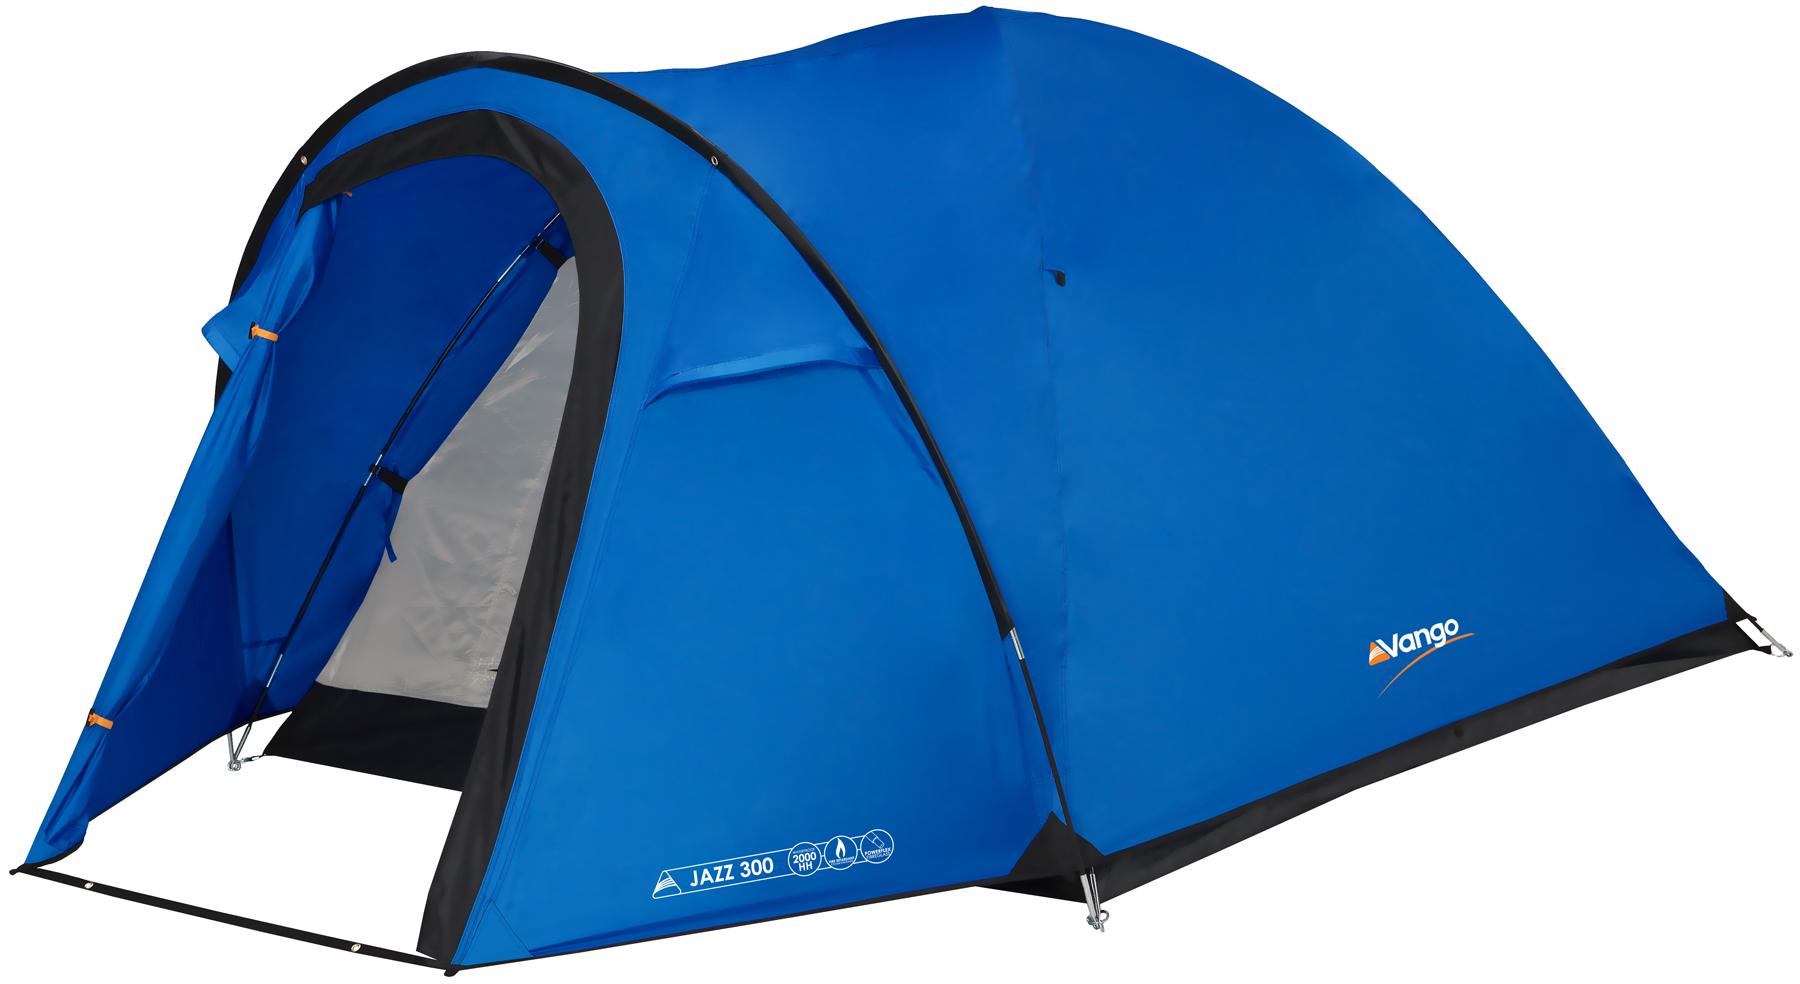 tente vango jazz 300 atlantic 3 personnes raviday camping. Black Bedroom Furniture Sets. Home Design Ideas